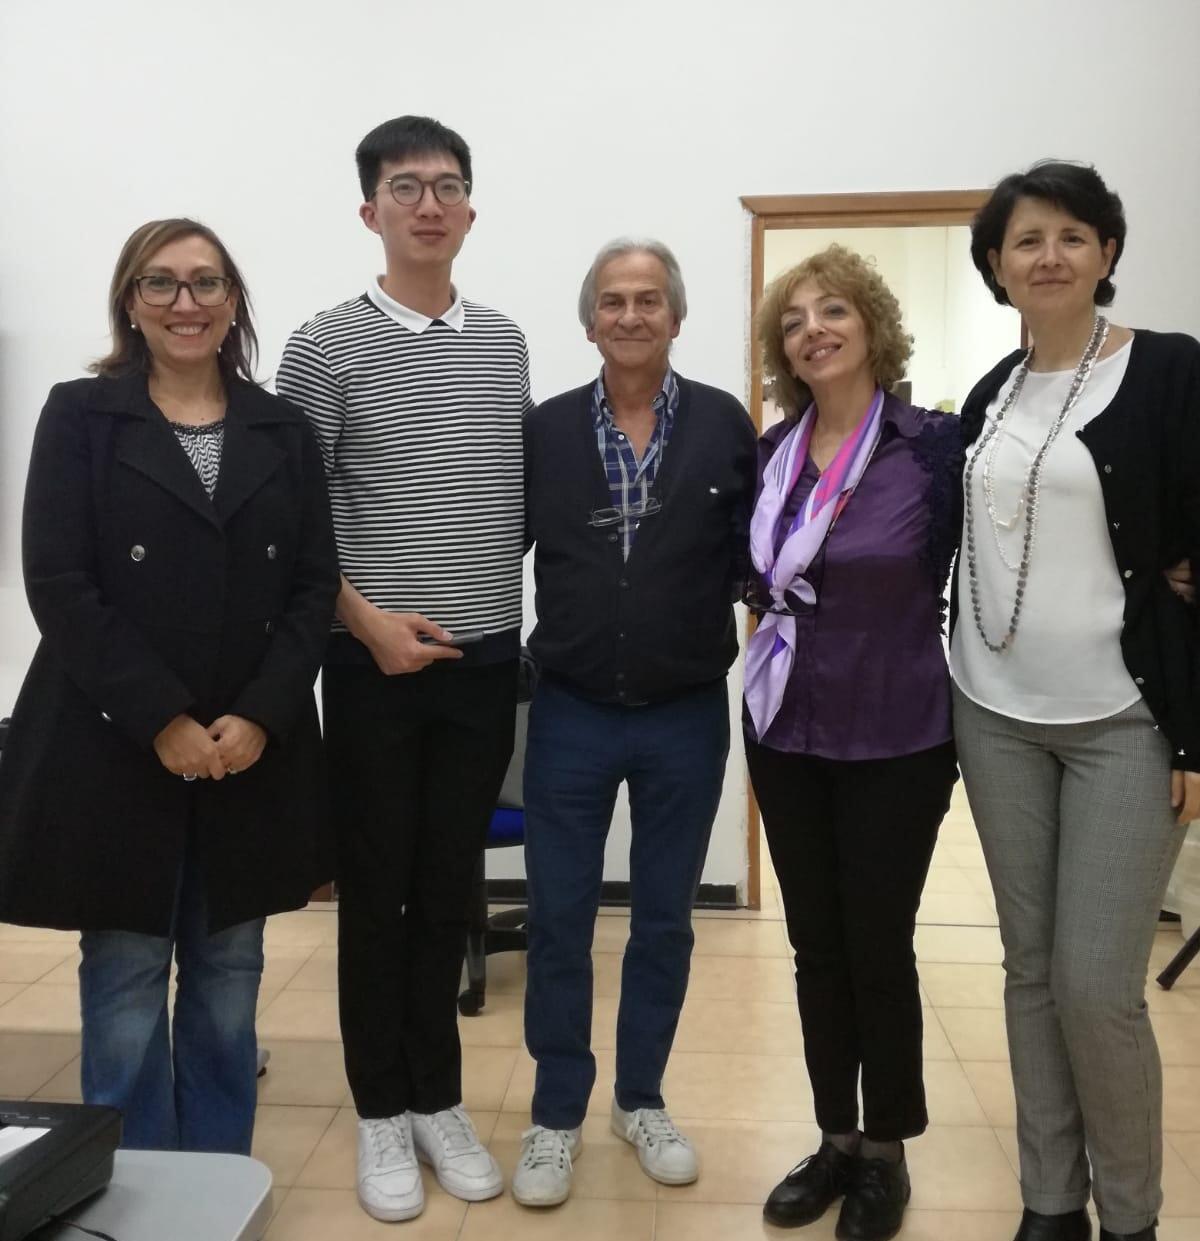 Lamonica-Studente-Giordano-Caponigro-Pastorino